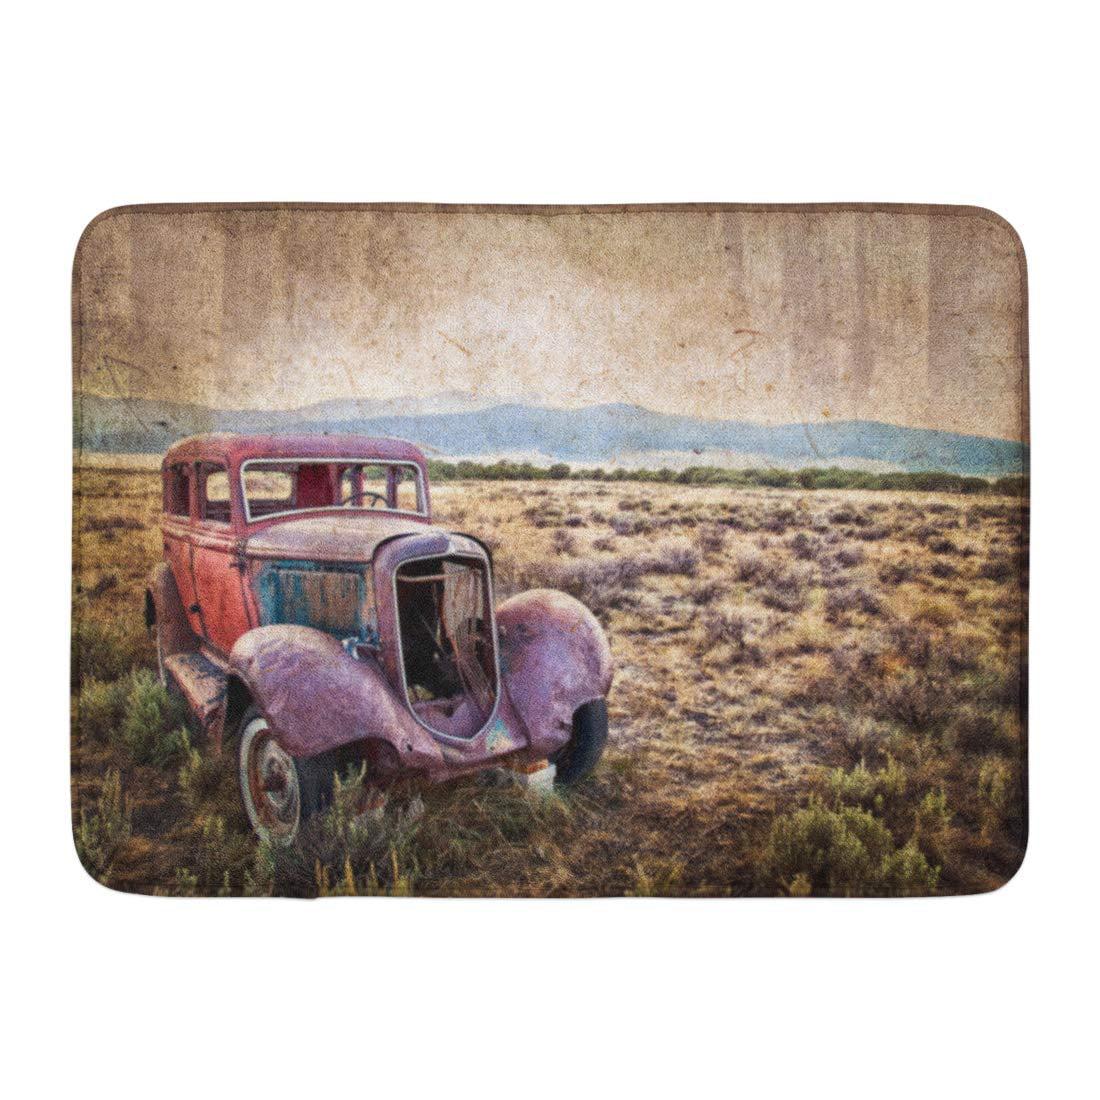 GODPOK Desert Wreck Rusty Wrecked Car Vintage Style